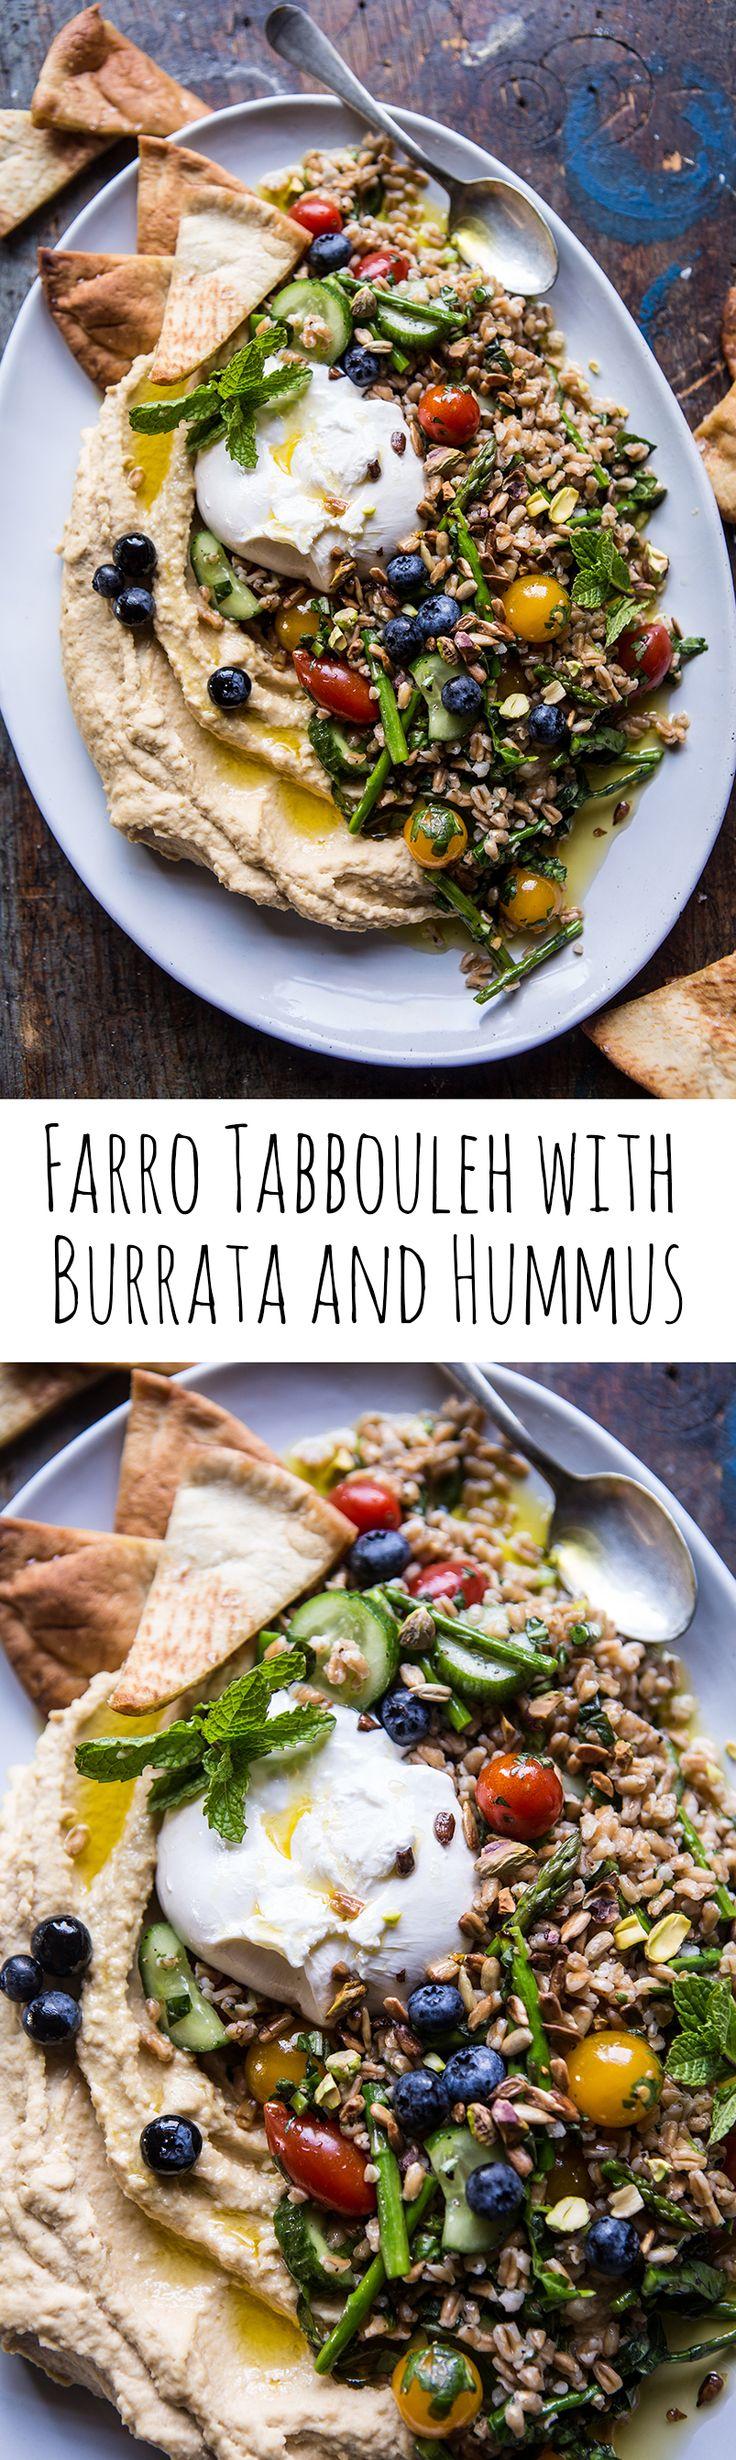 Farro Tabbouleh with Burrata and Hummus   halfbakedharvest.com @hbharvest